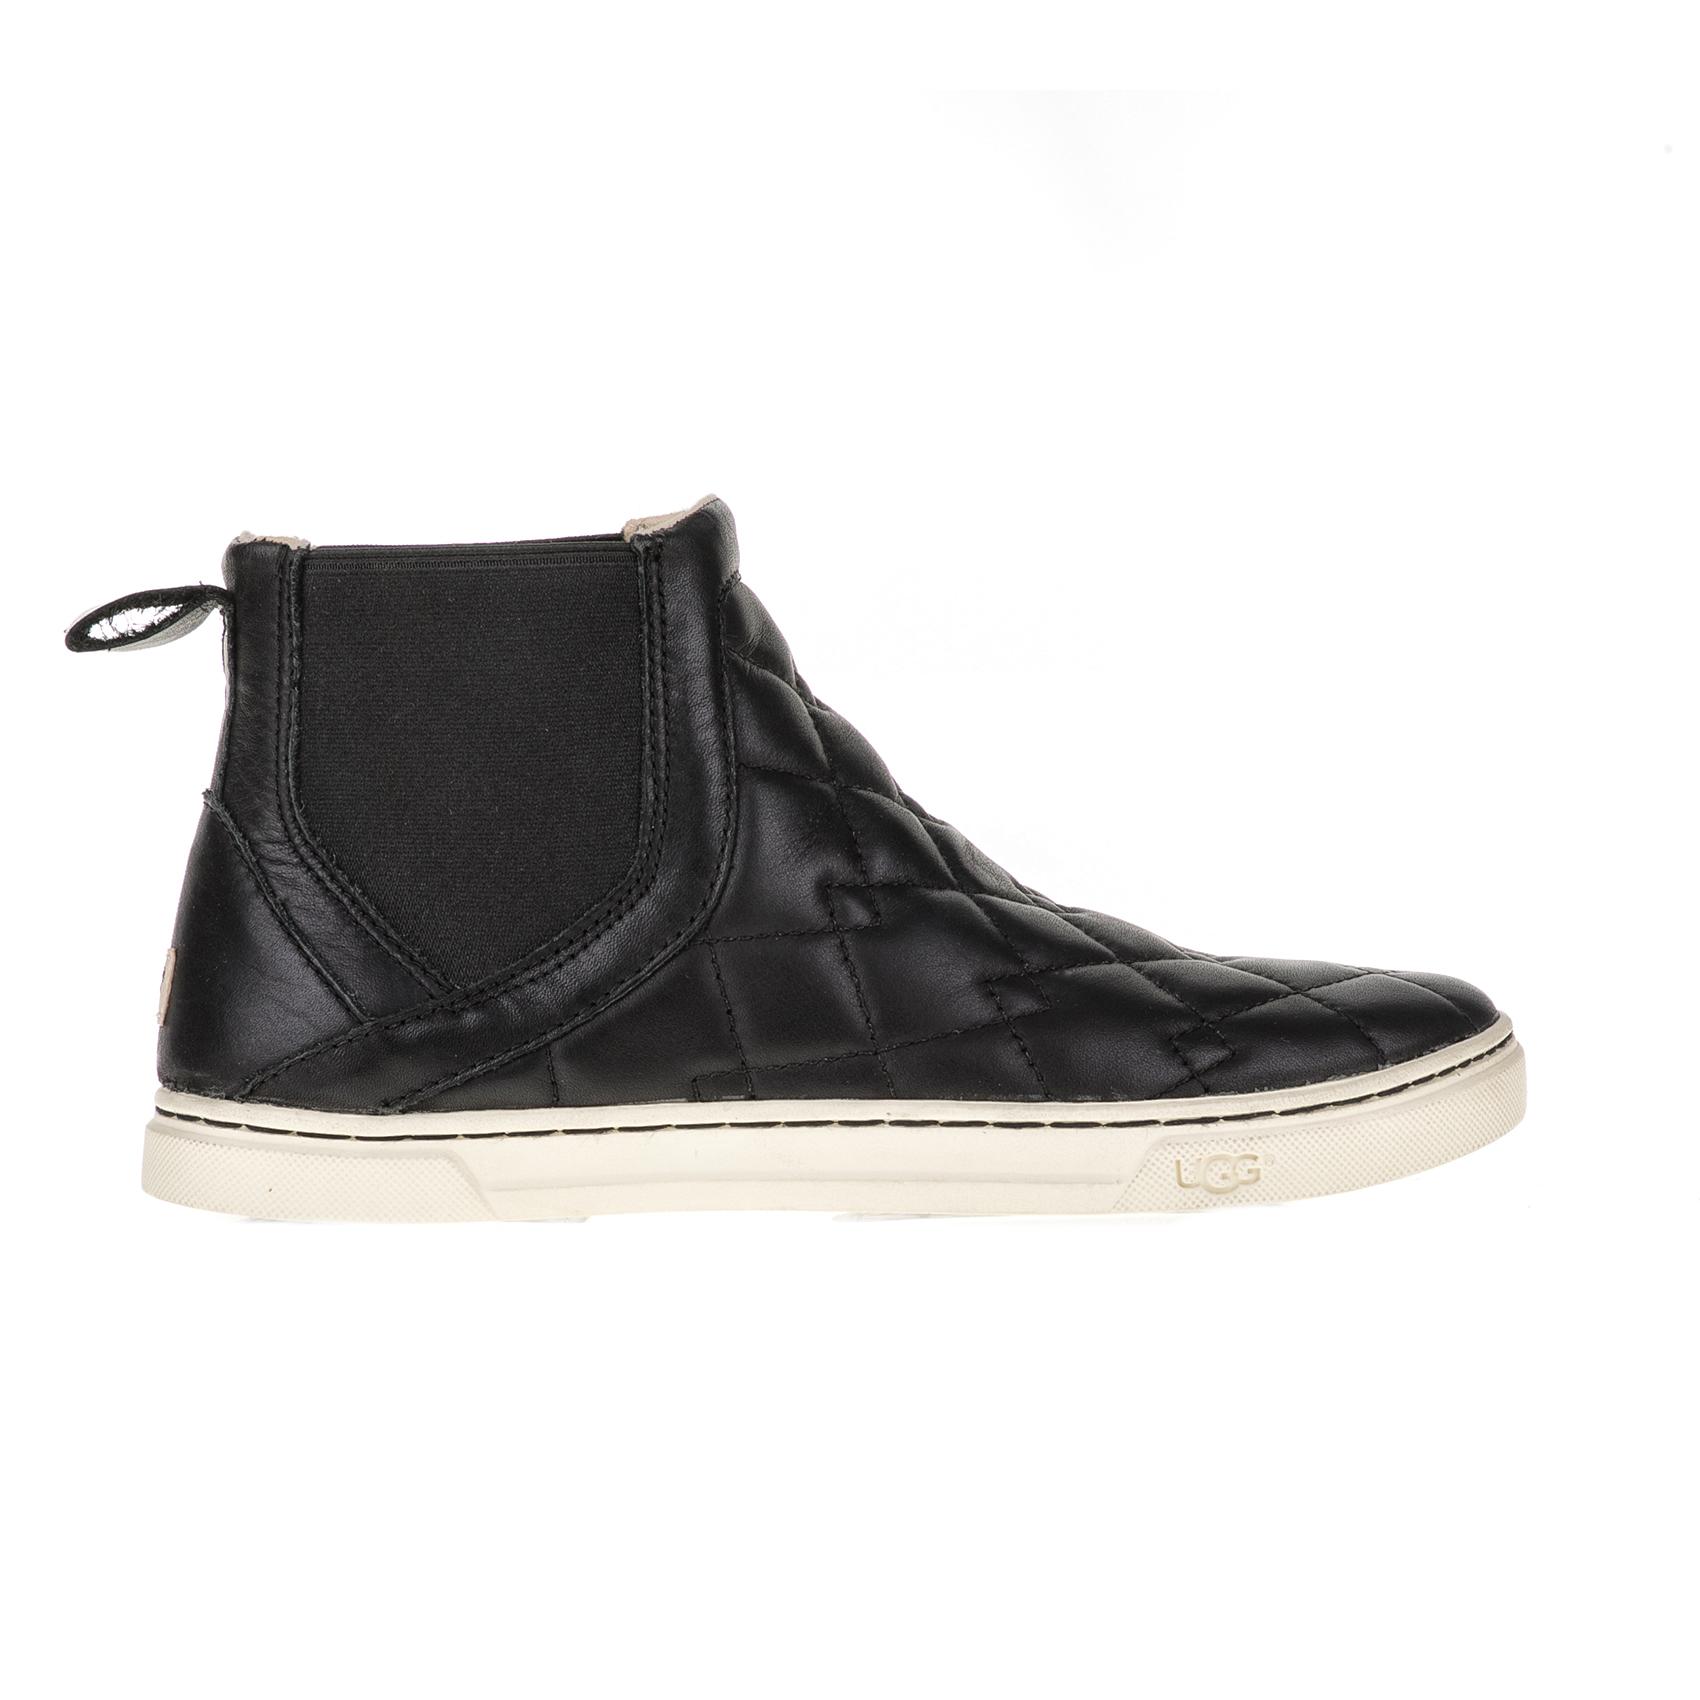 UGG AUSTRALIA - Γυναικεία μποτάκια HOLLYN DECO QUILT UGG AUSTRALIA μαύρα γυναικεία παπούτσια μπότες μποτάκια μποτάκια